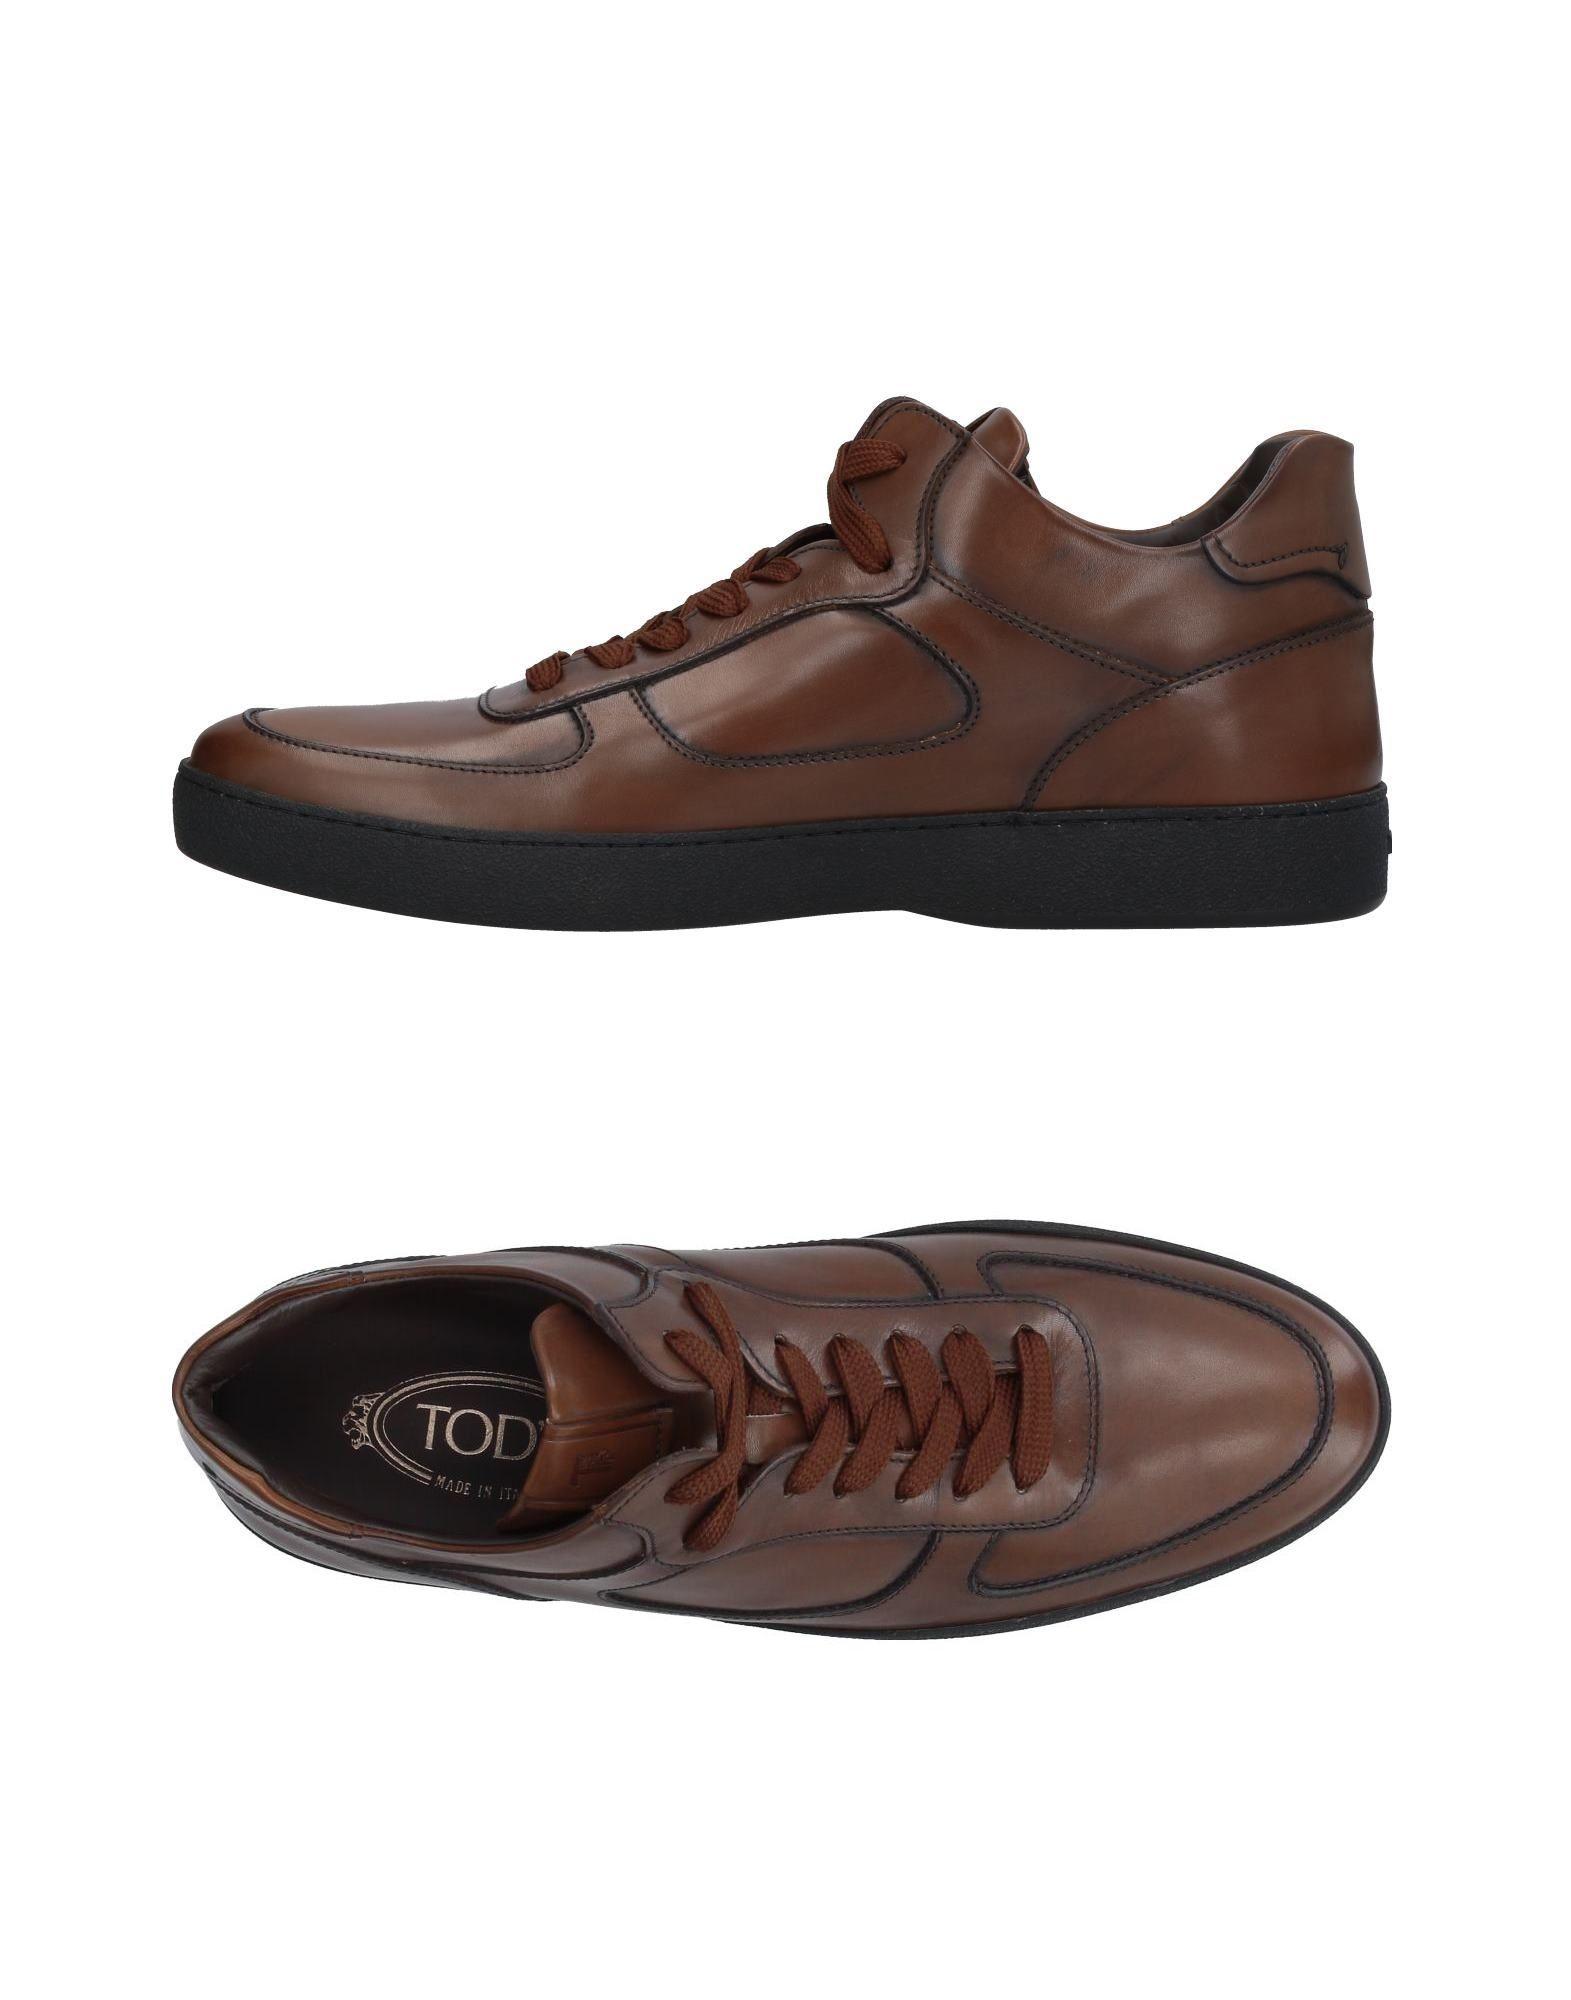 A buon mercato Sneakers Tod's Uomo - 11397835UH